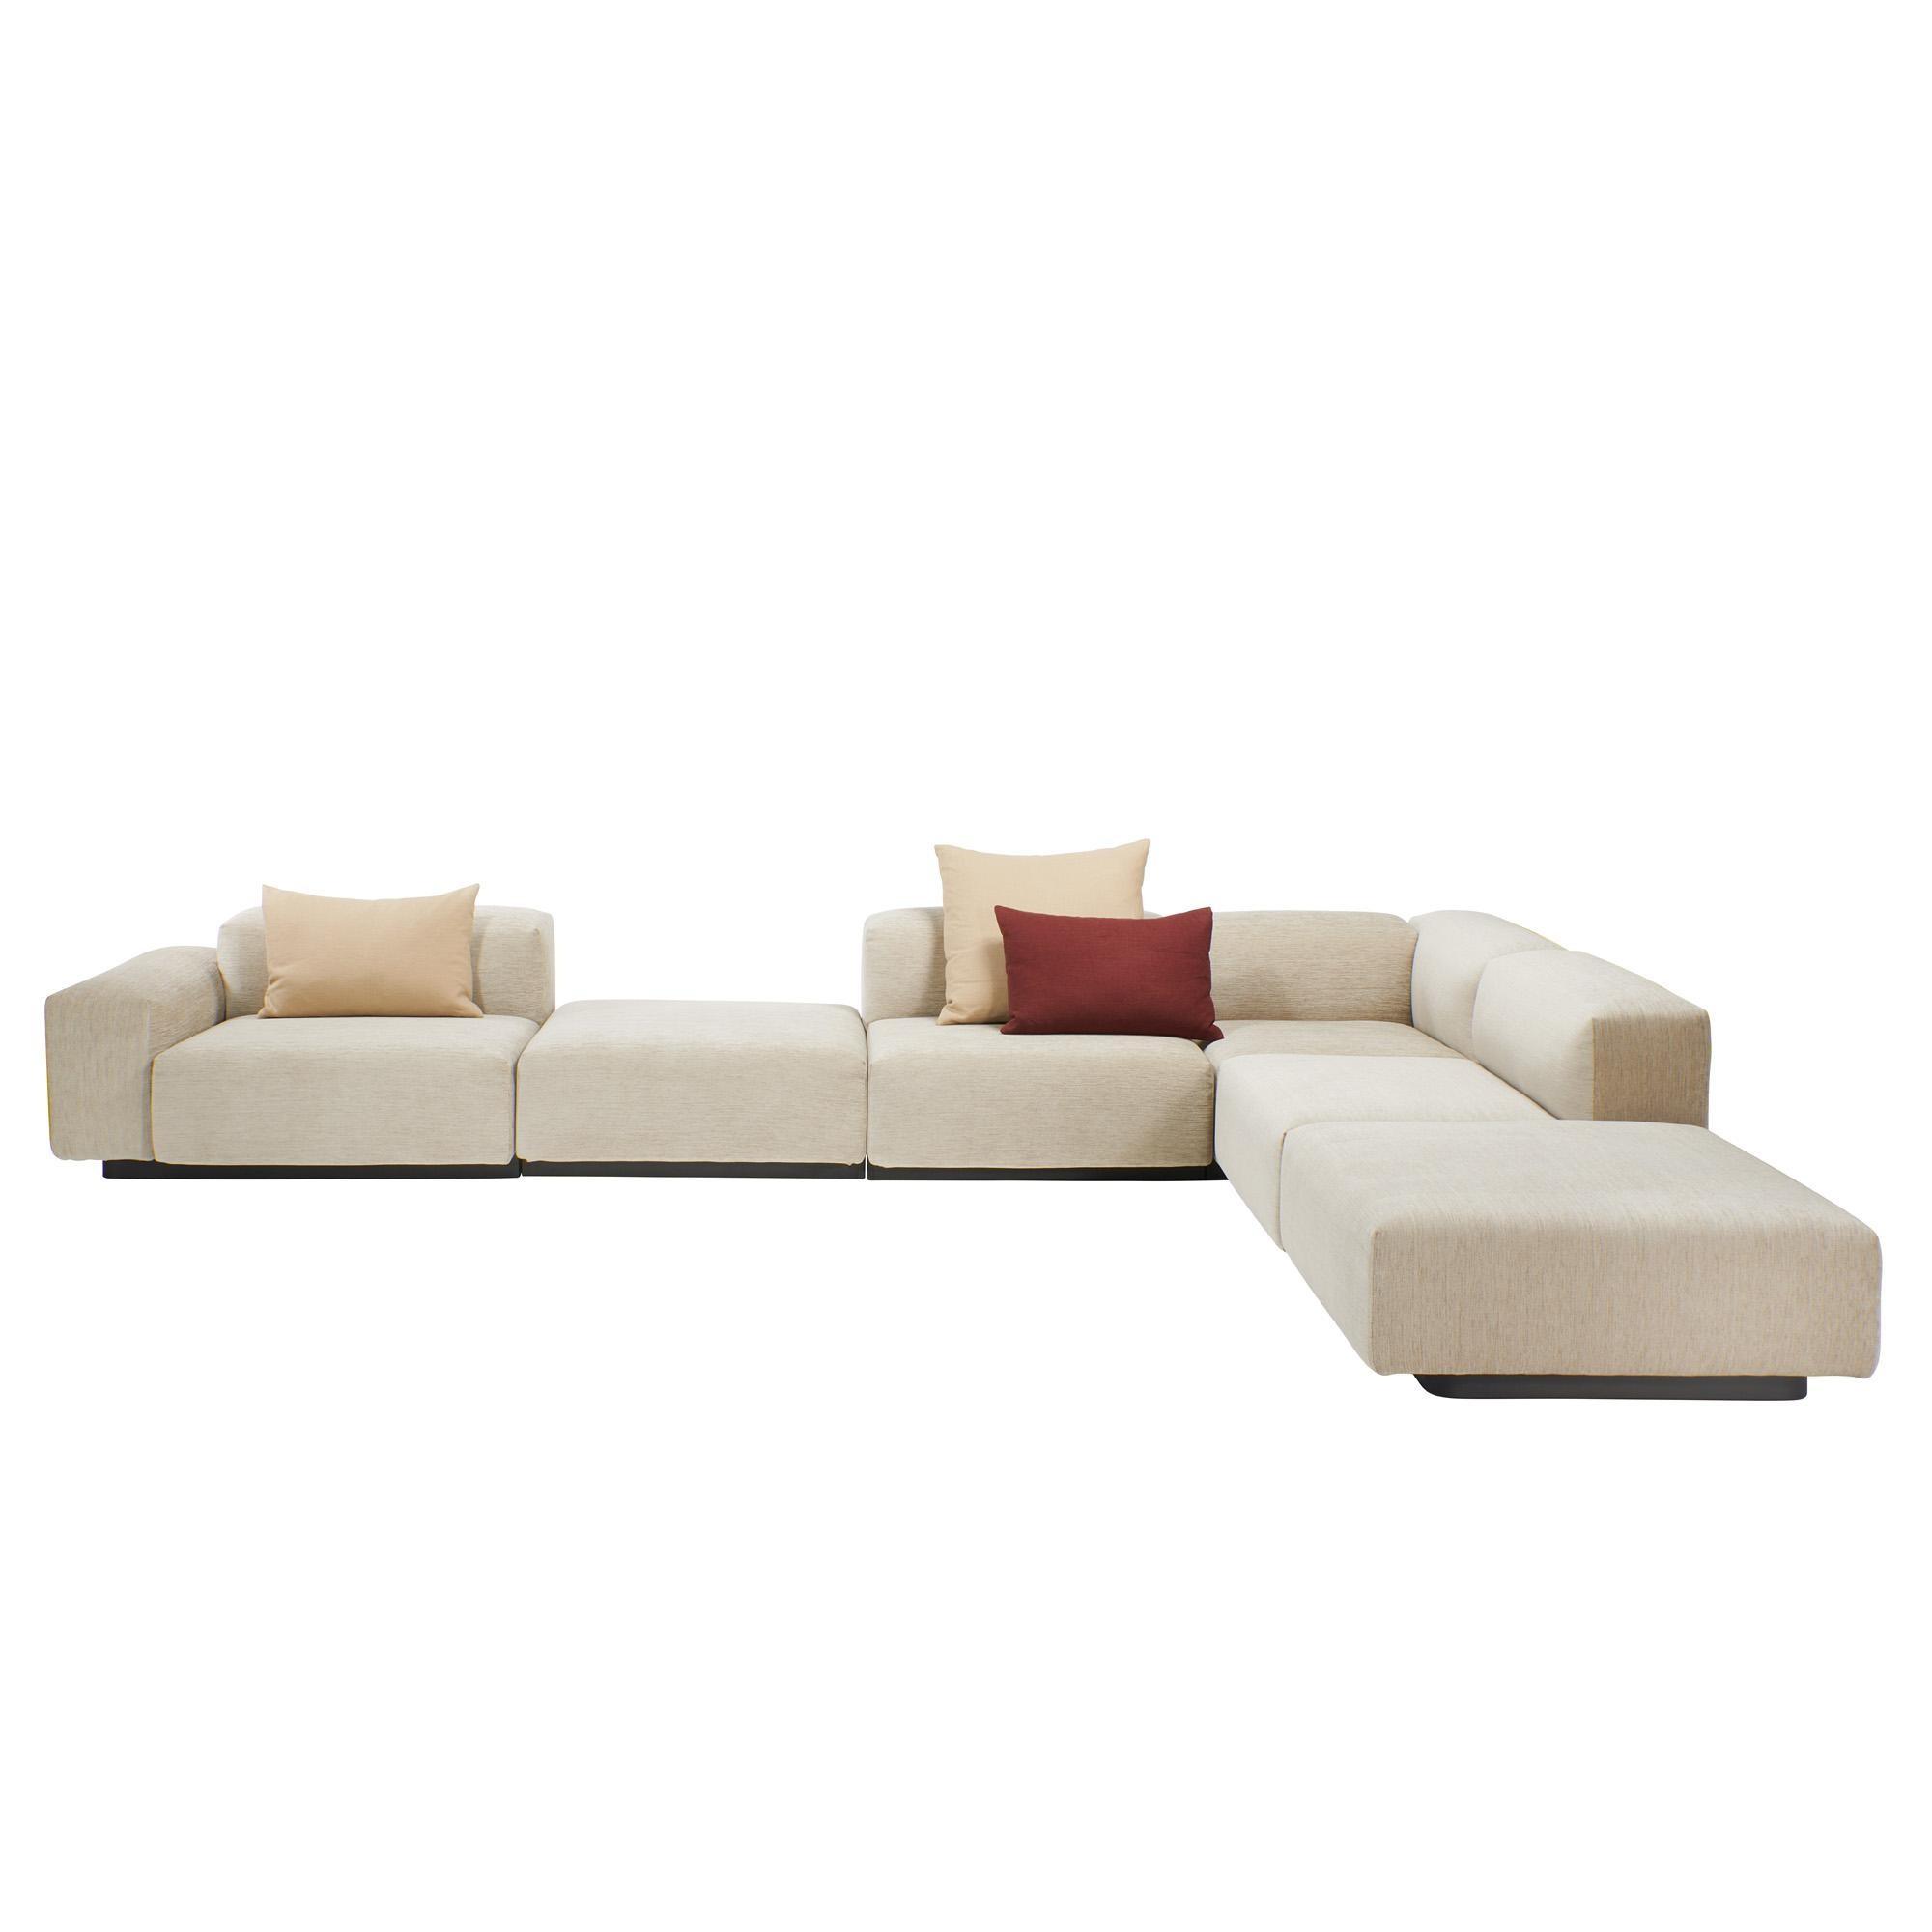 Full Size of Vitra Sofa Soft Modular Corner Ambientedirect L Form Poco Big Lagerverkauf Englisches Alcantara Aus Matratzen Alternatives Bezug Ausziehbar Barock Leder Bunt U Sofa Vitra Sofa